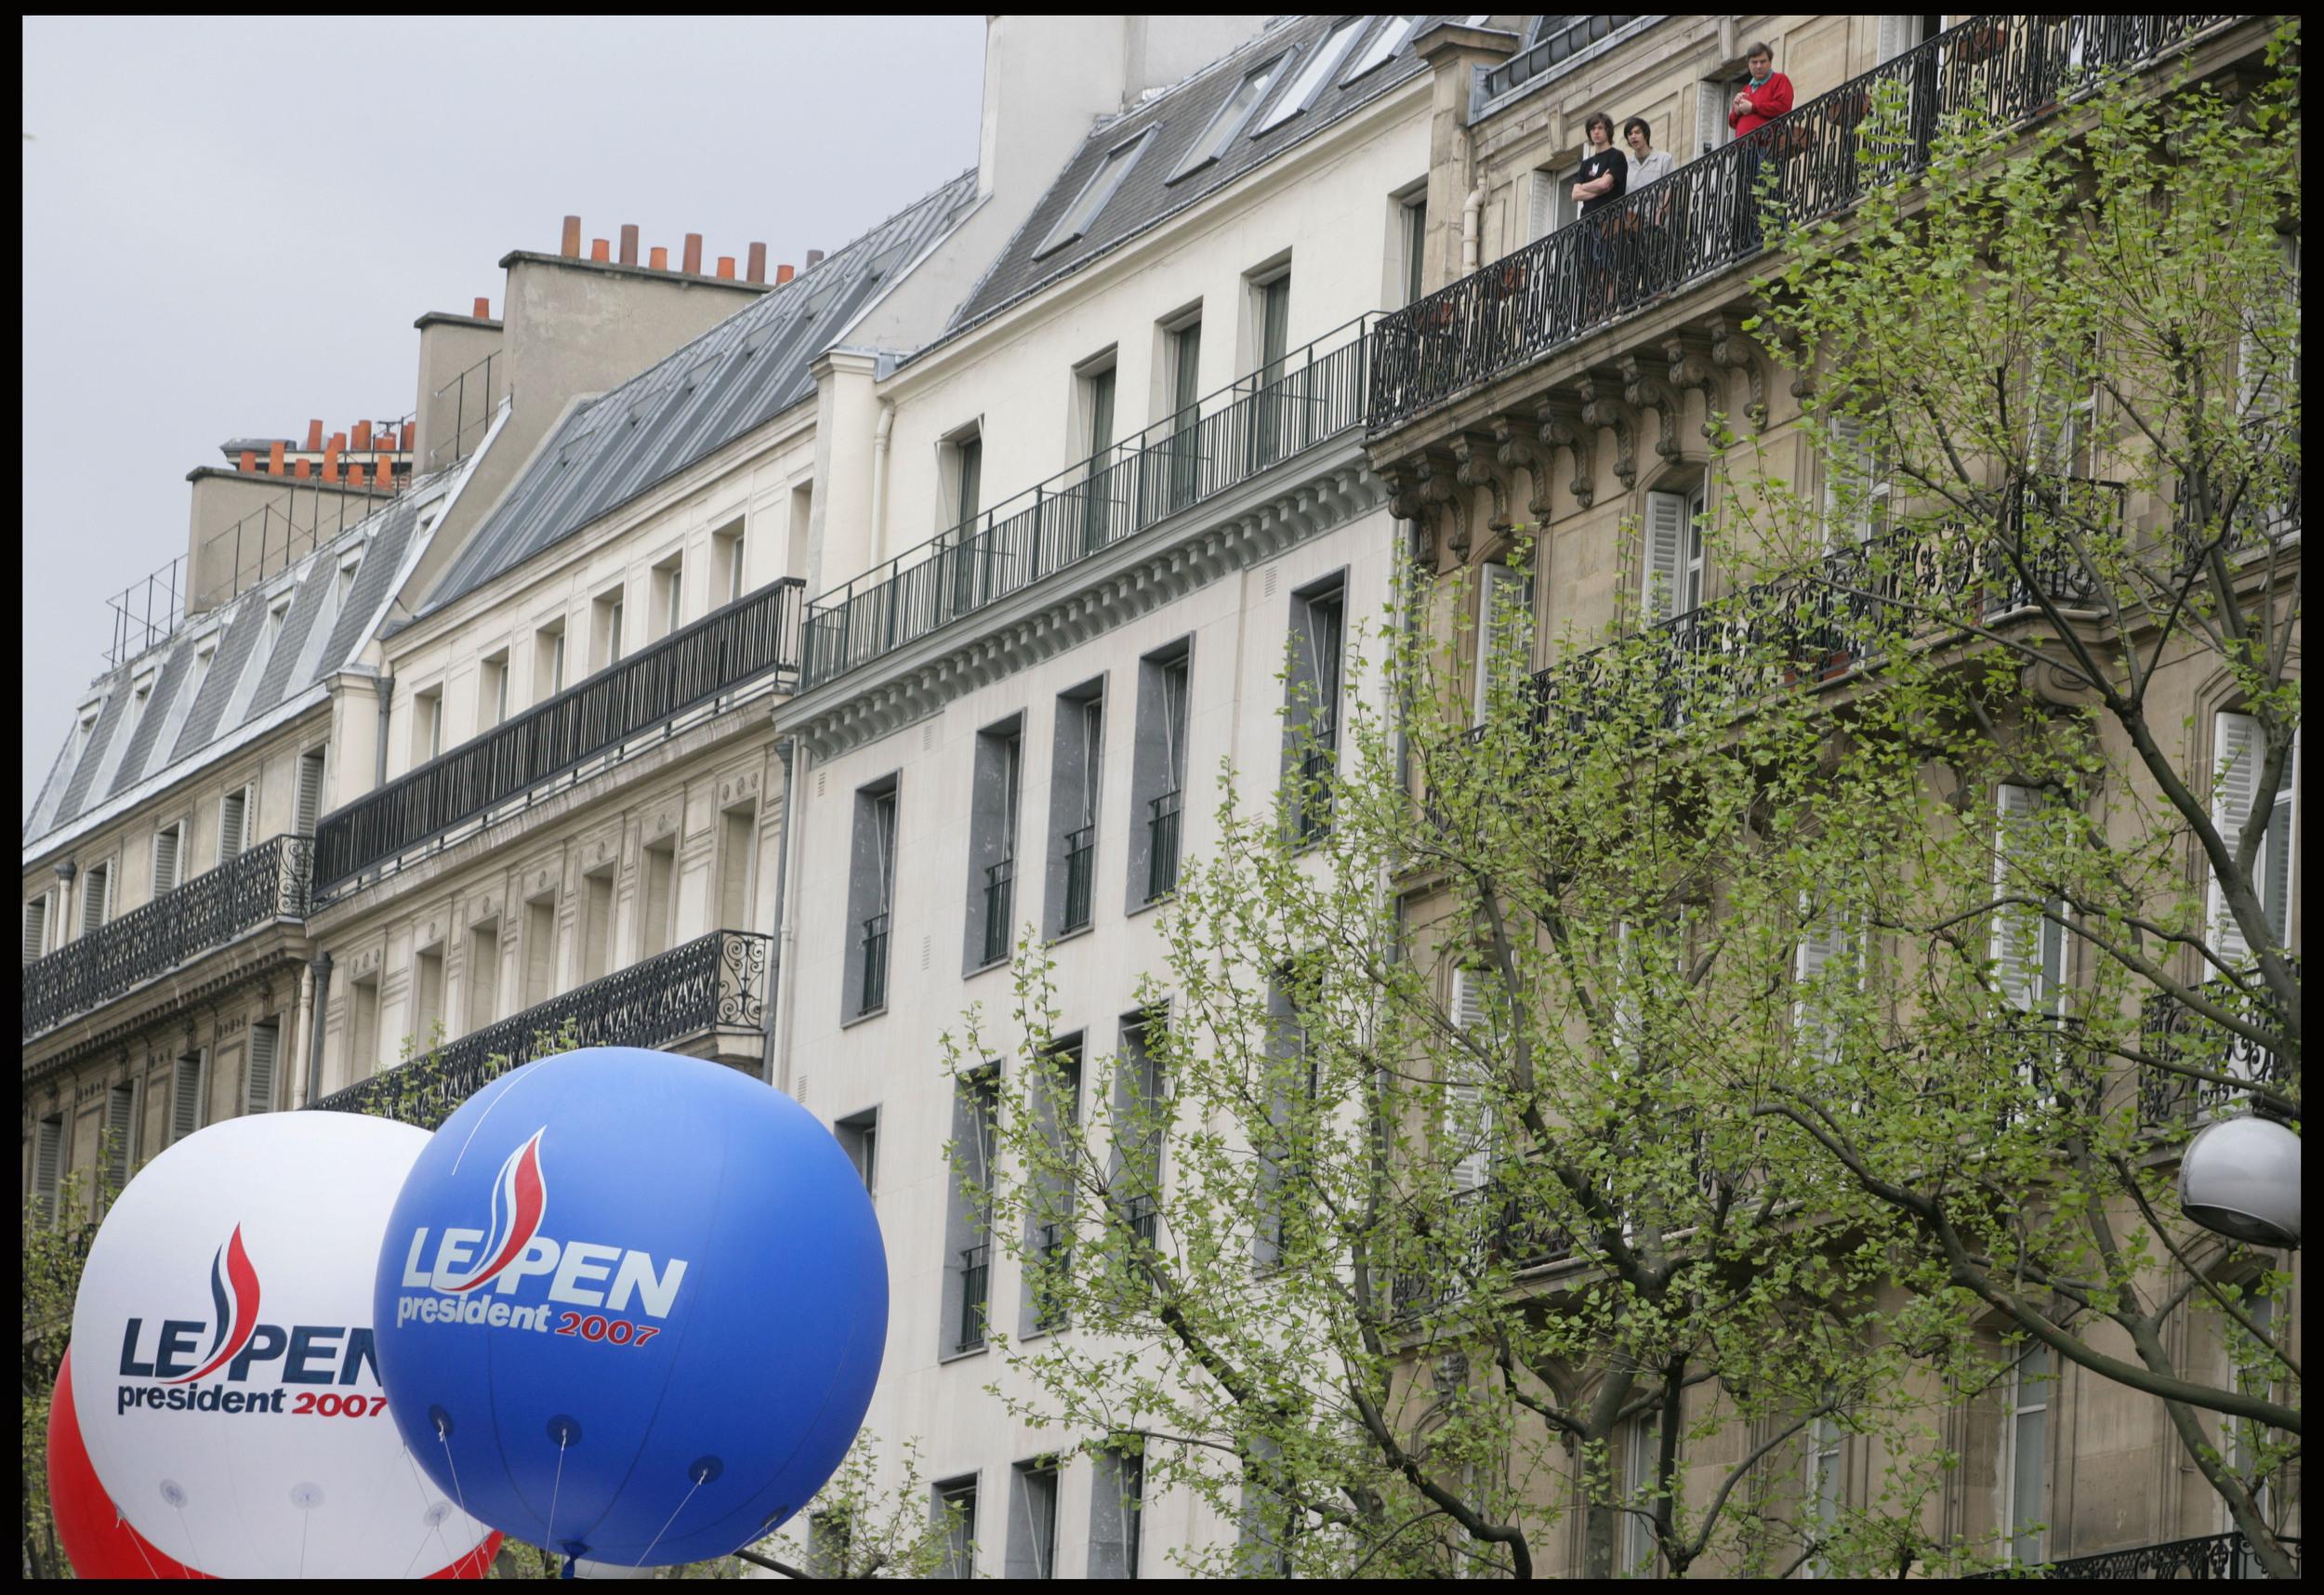 Le Pen rally, central Paris